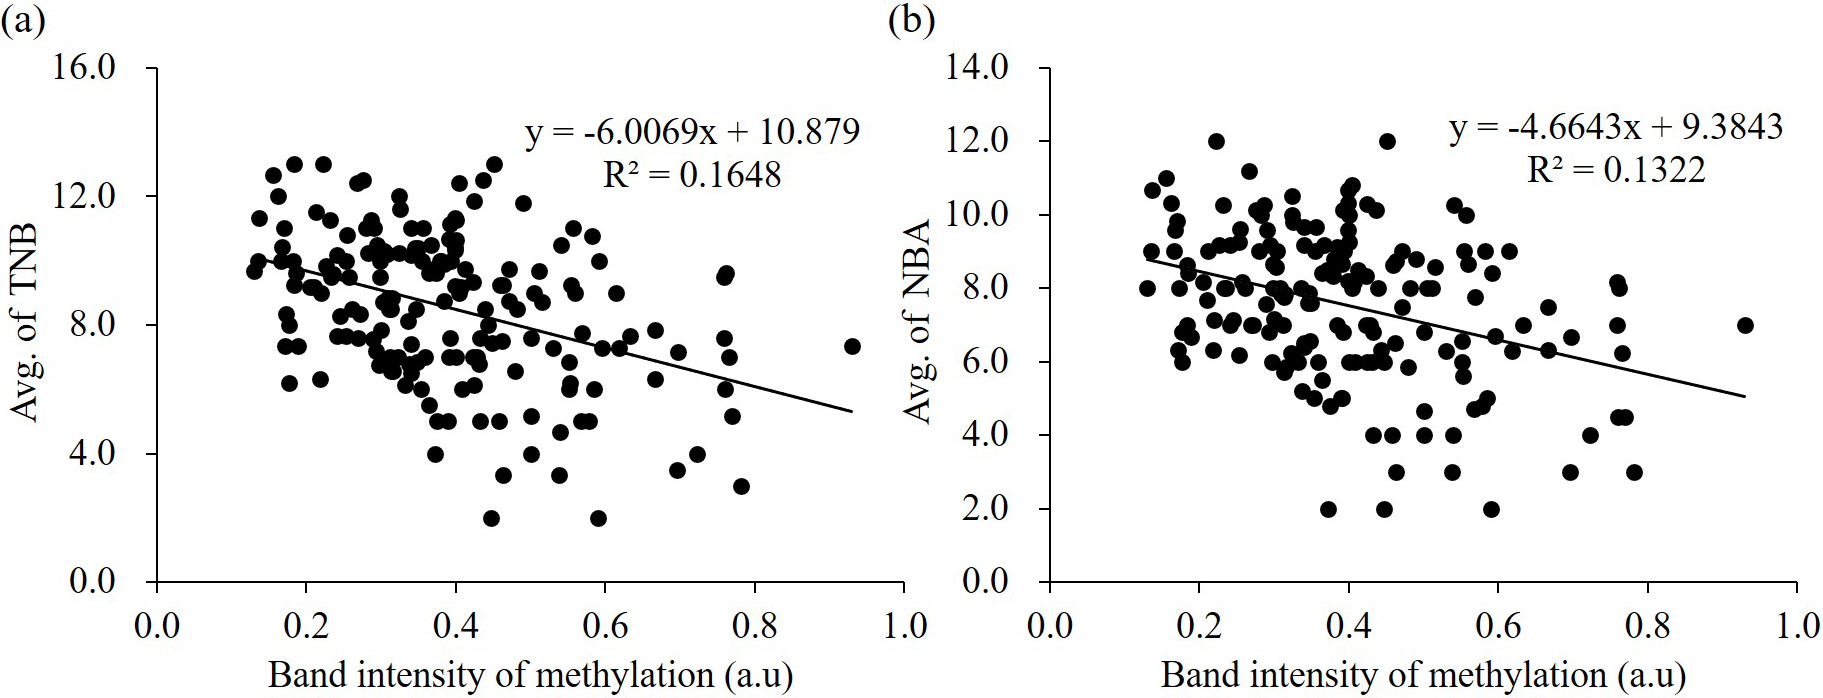 Hypomethylation In The Promoter Region Of ZPBP As A